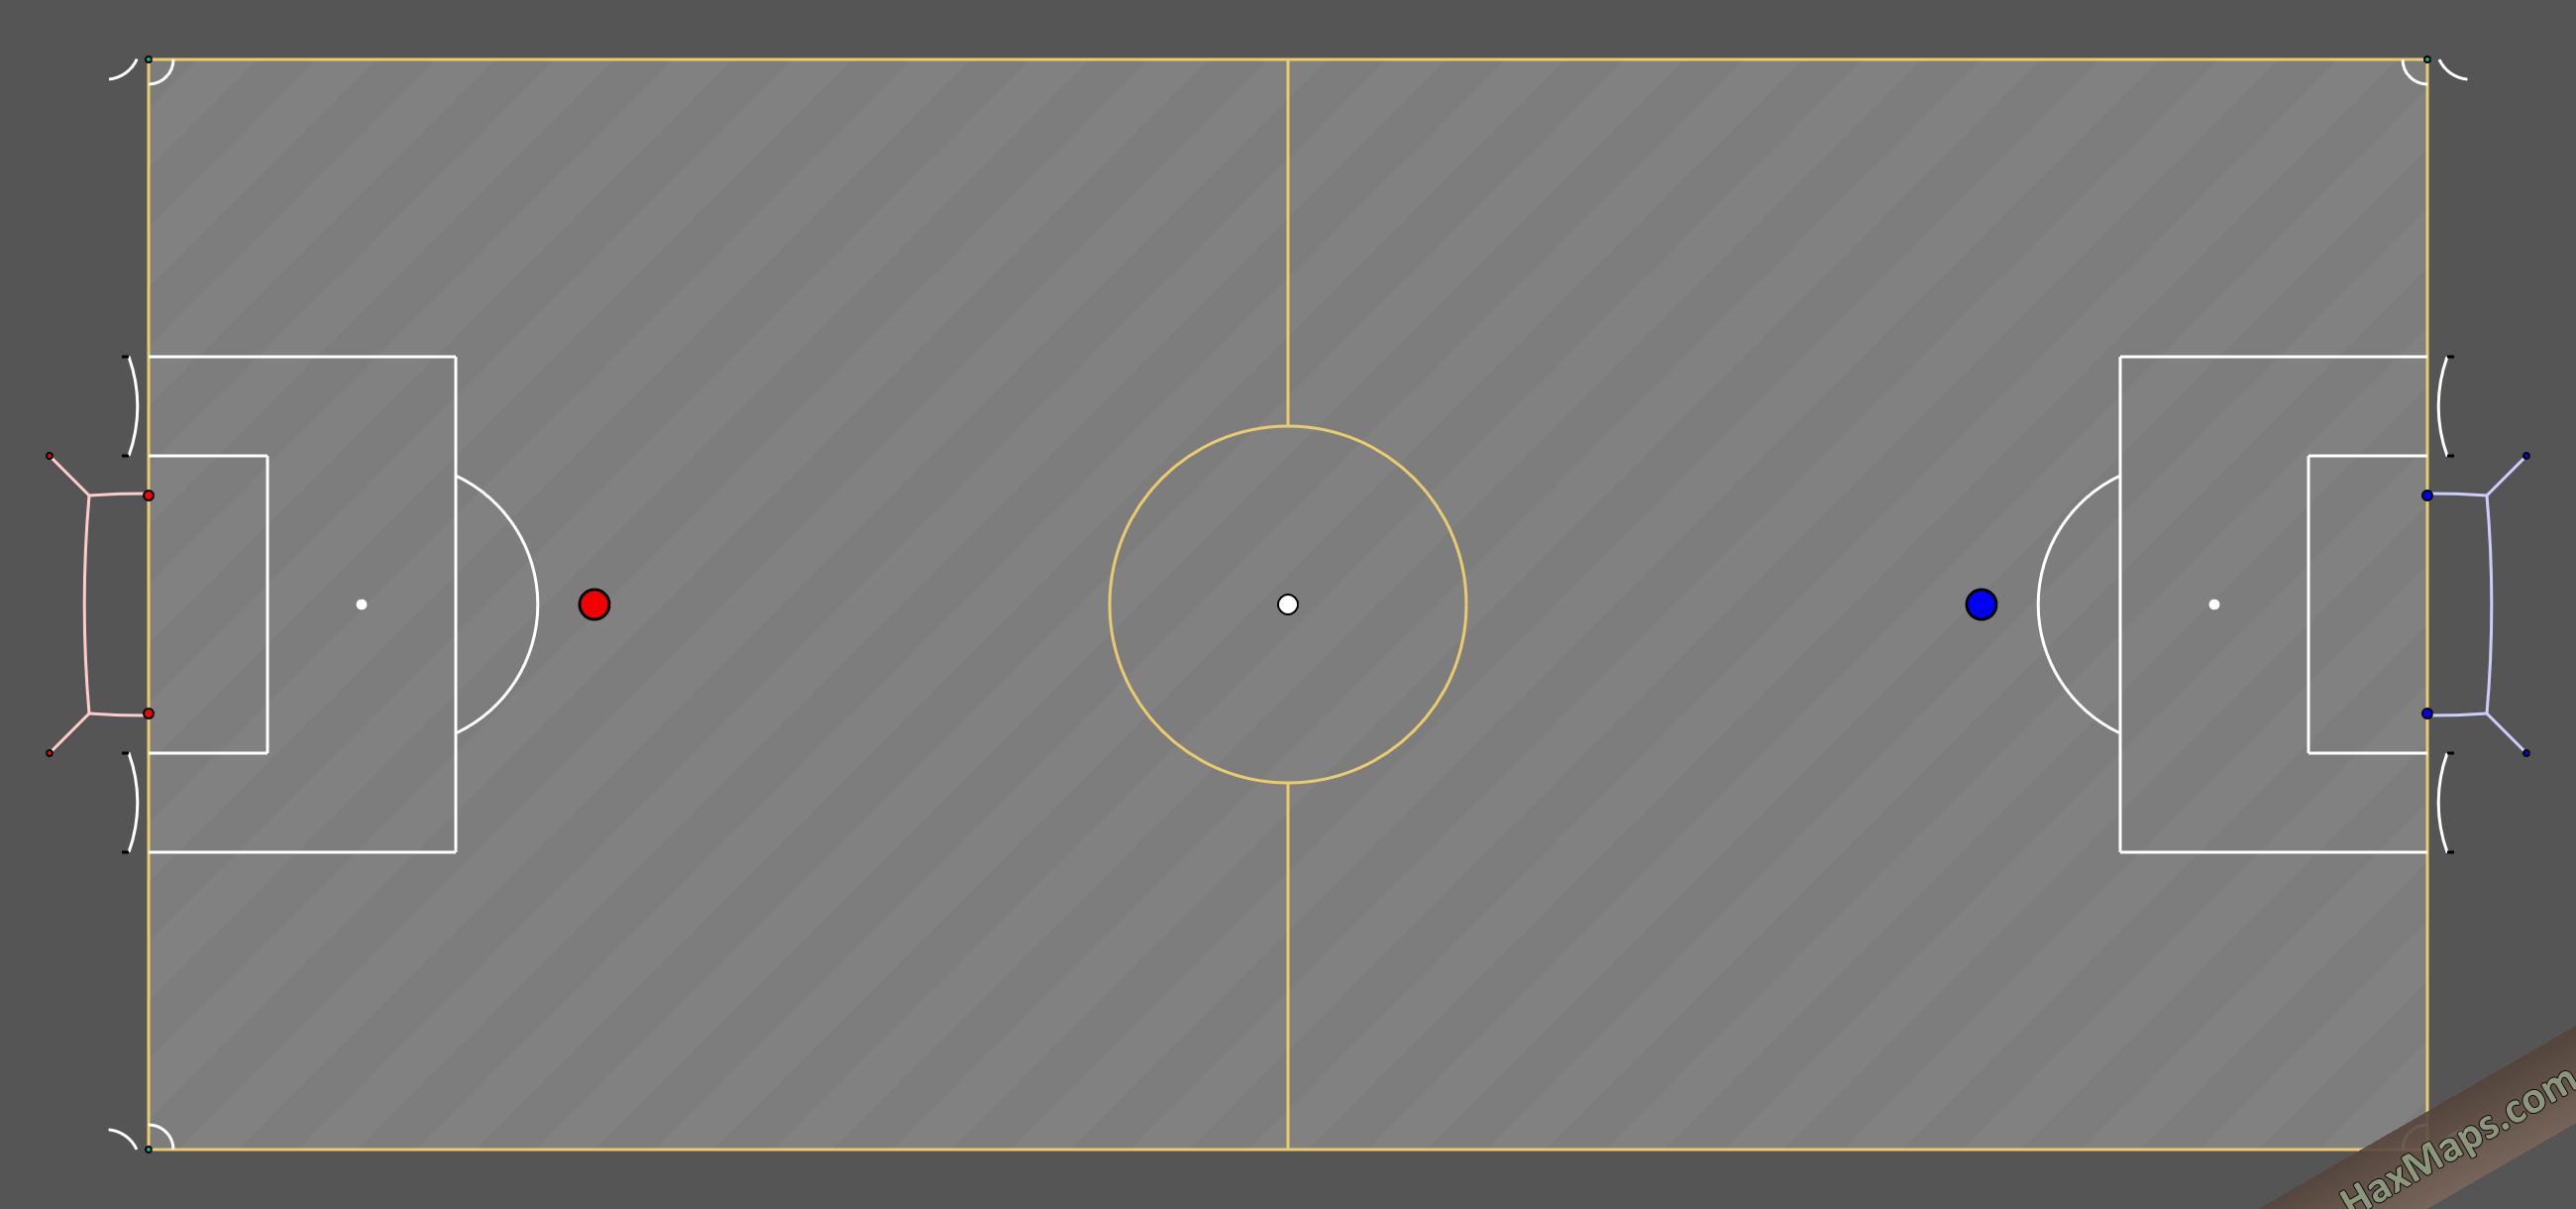 hax ball maps | Real Futsal v4 v5 byTatiCT